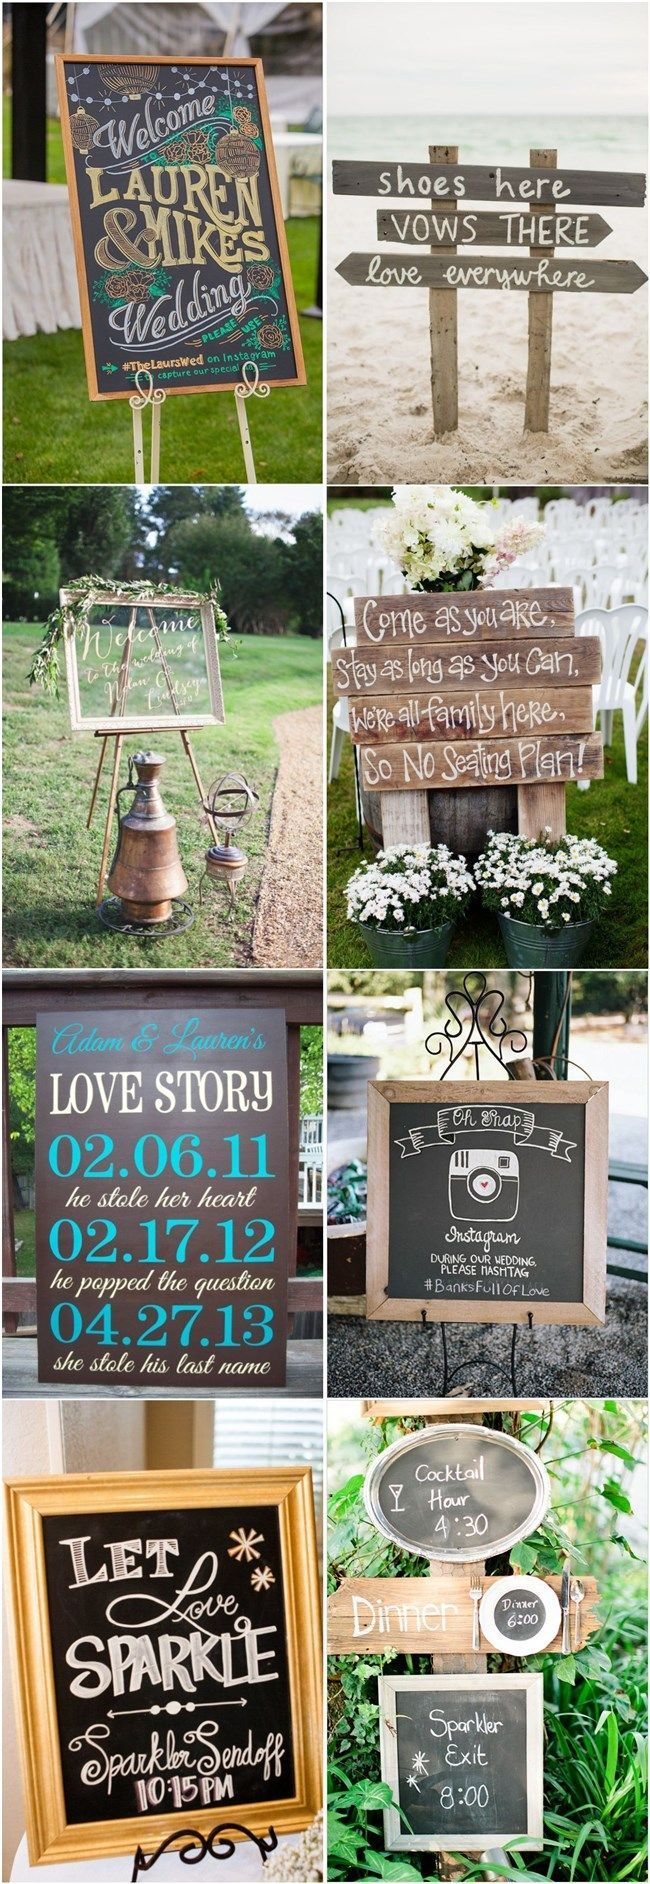 rustic wedding signs - rustic wedding decor ideas repinned by michael eric berrios DJMC #weddingdj